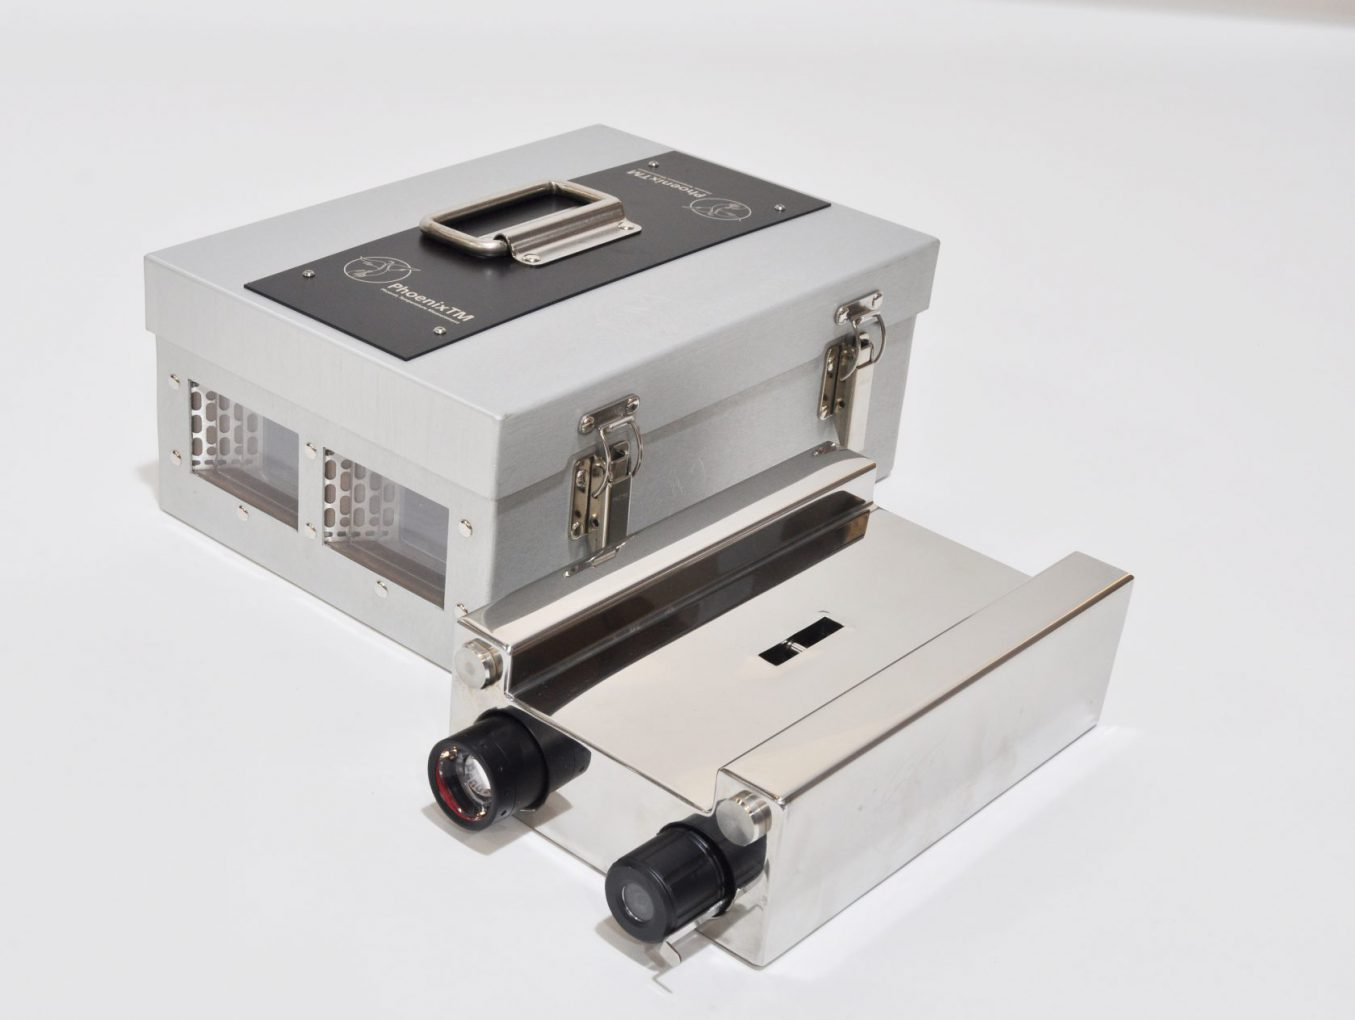 PhoenixTM VIS64 Optic System for Powder Coating Oven | Tonan Asia Autotech